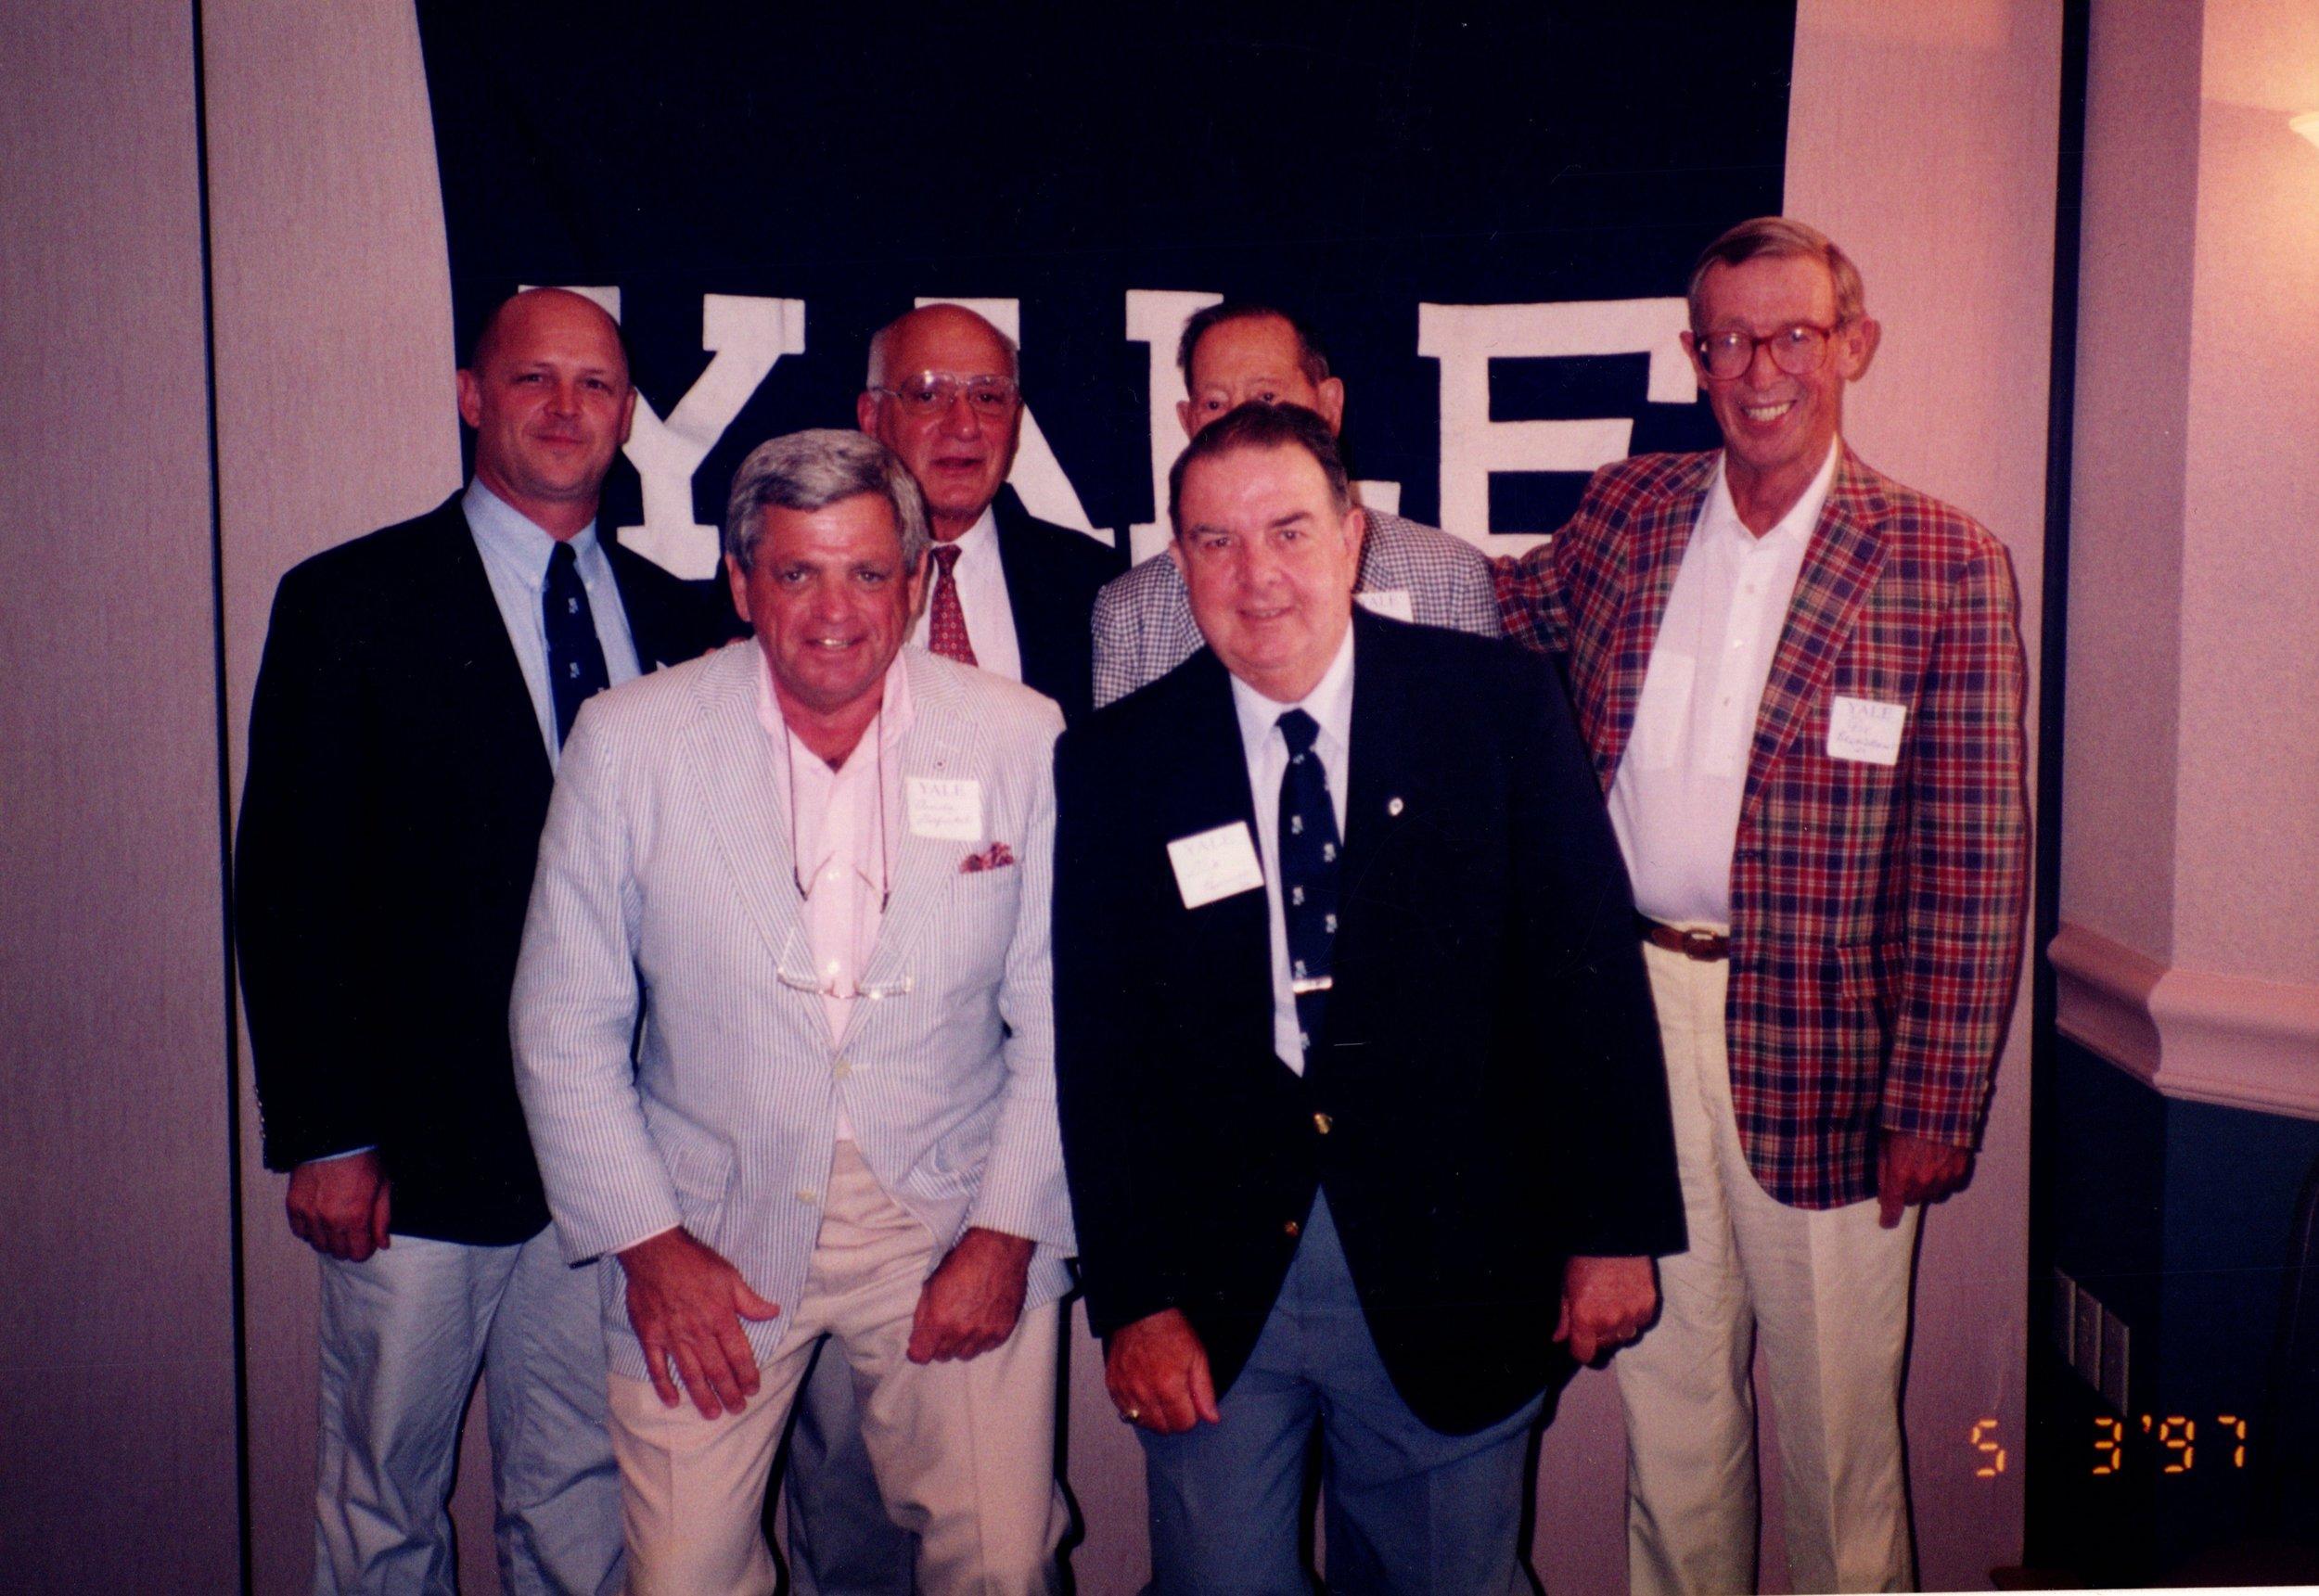 BACK ROW: JACK SIEDLECKI, CARM COZZA, CHARLIE O'HERN '24S, PETE BROADBENT '47E FRONT ROW: ARNOLD GARFINKEL '62MA, DICK BENNEETT '52